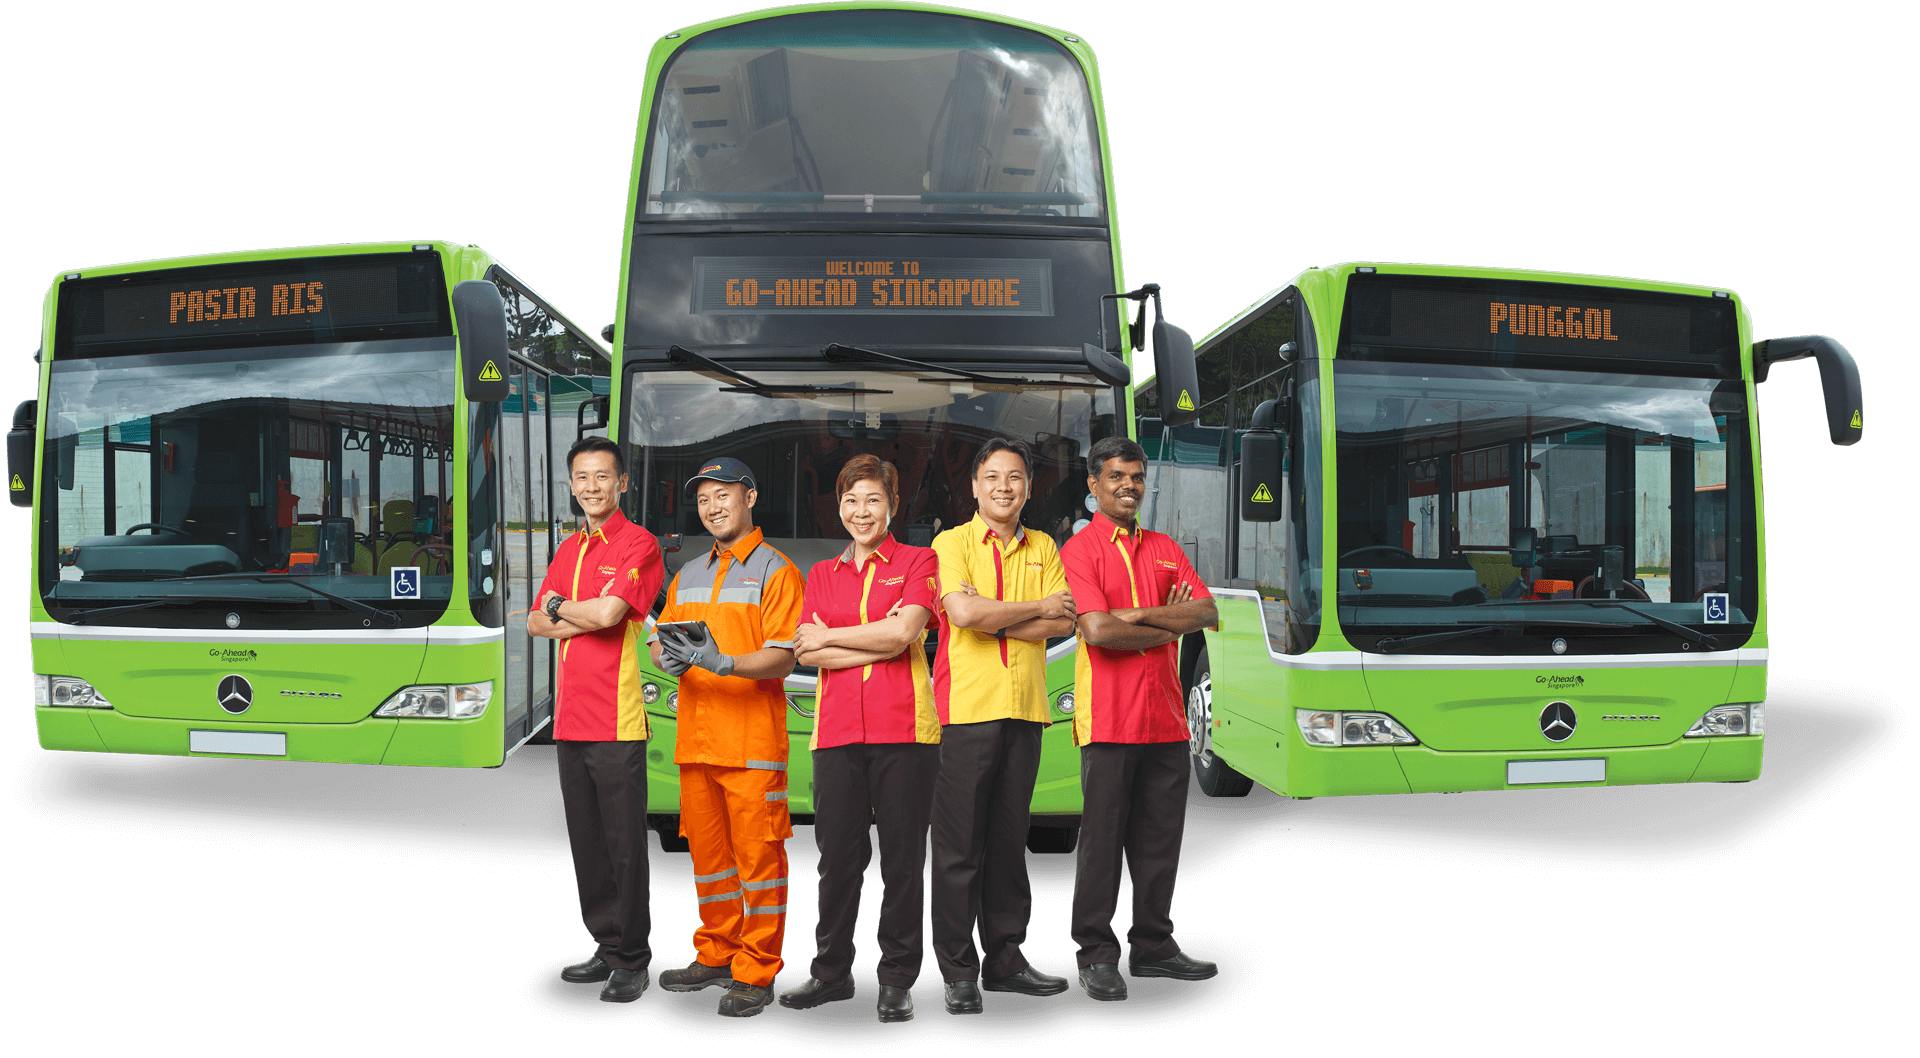 Go ahead Singapore buses